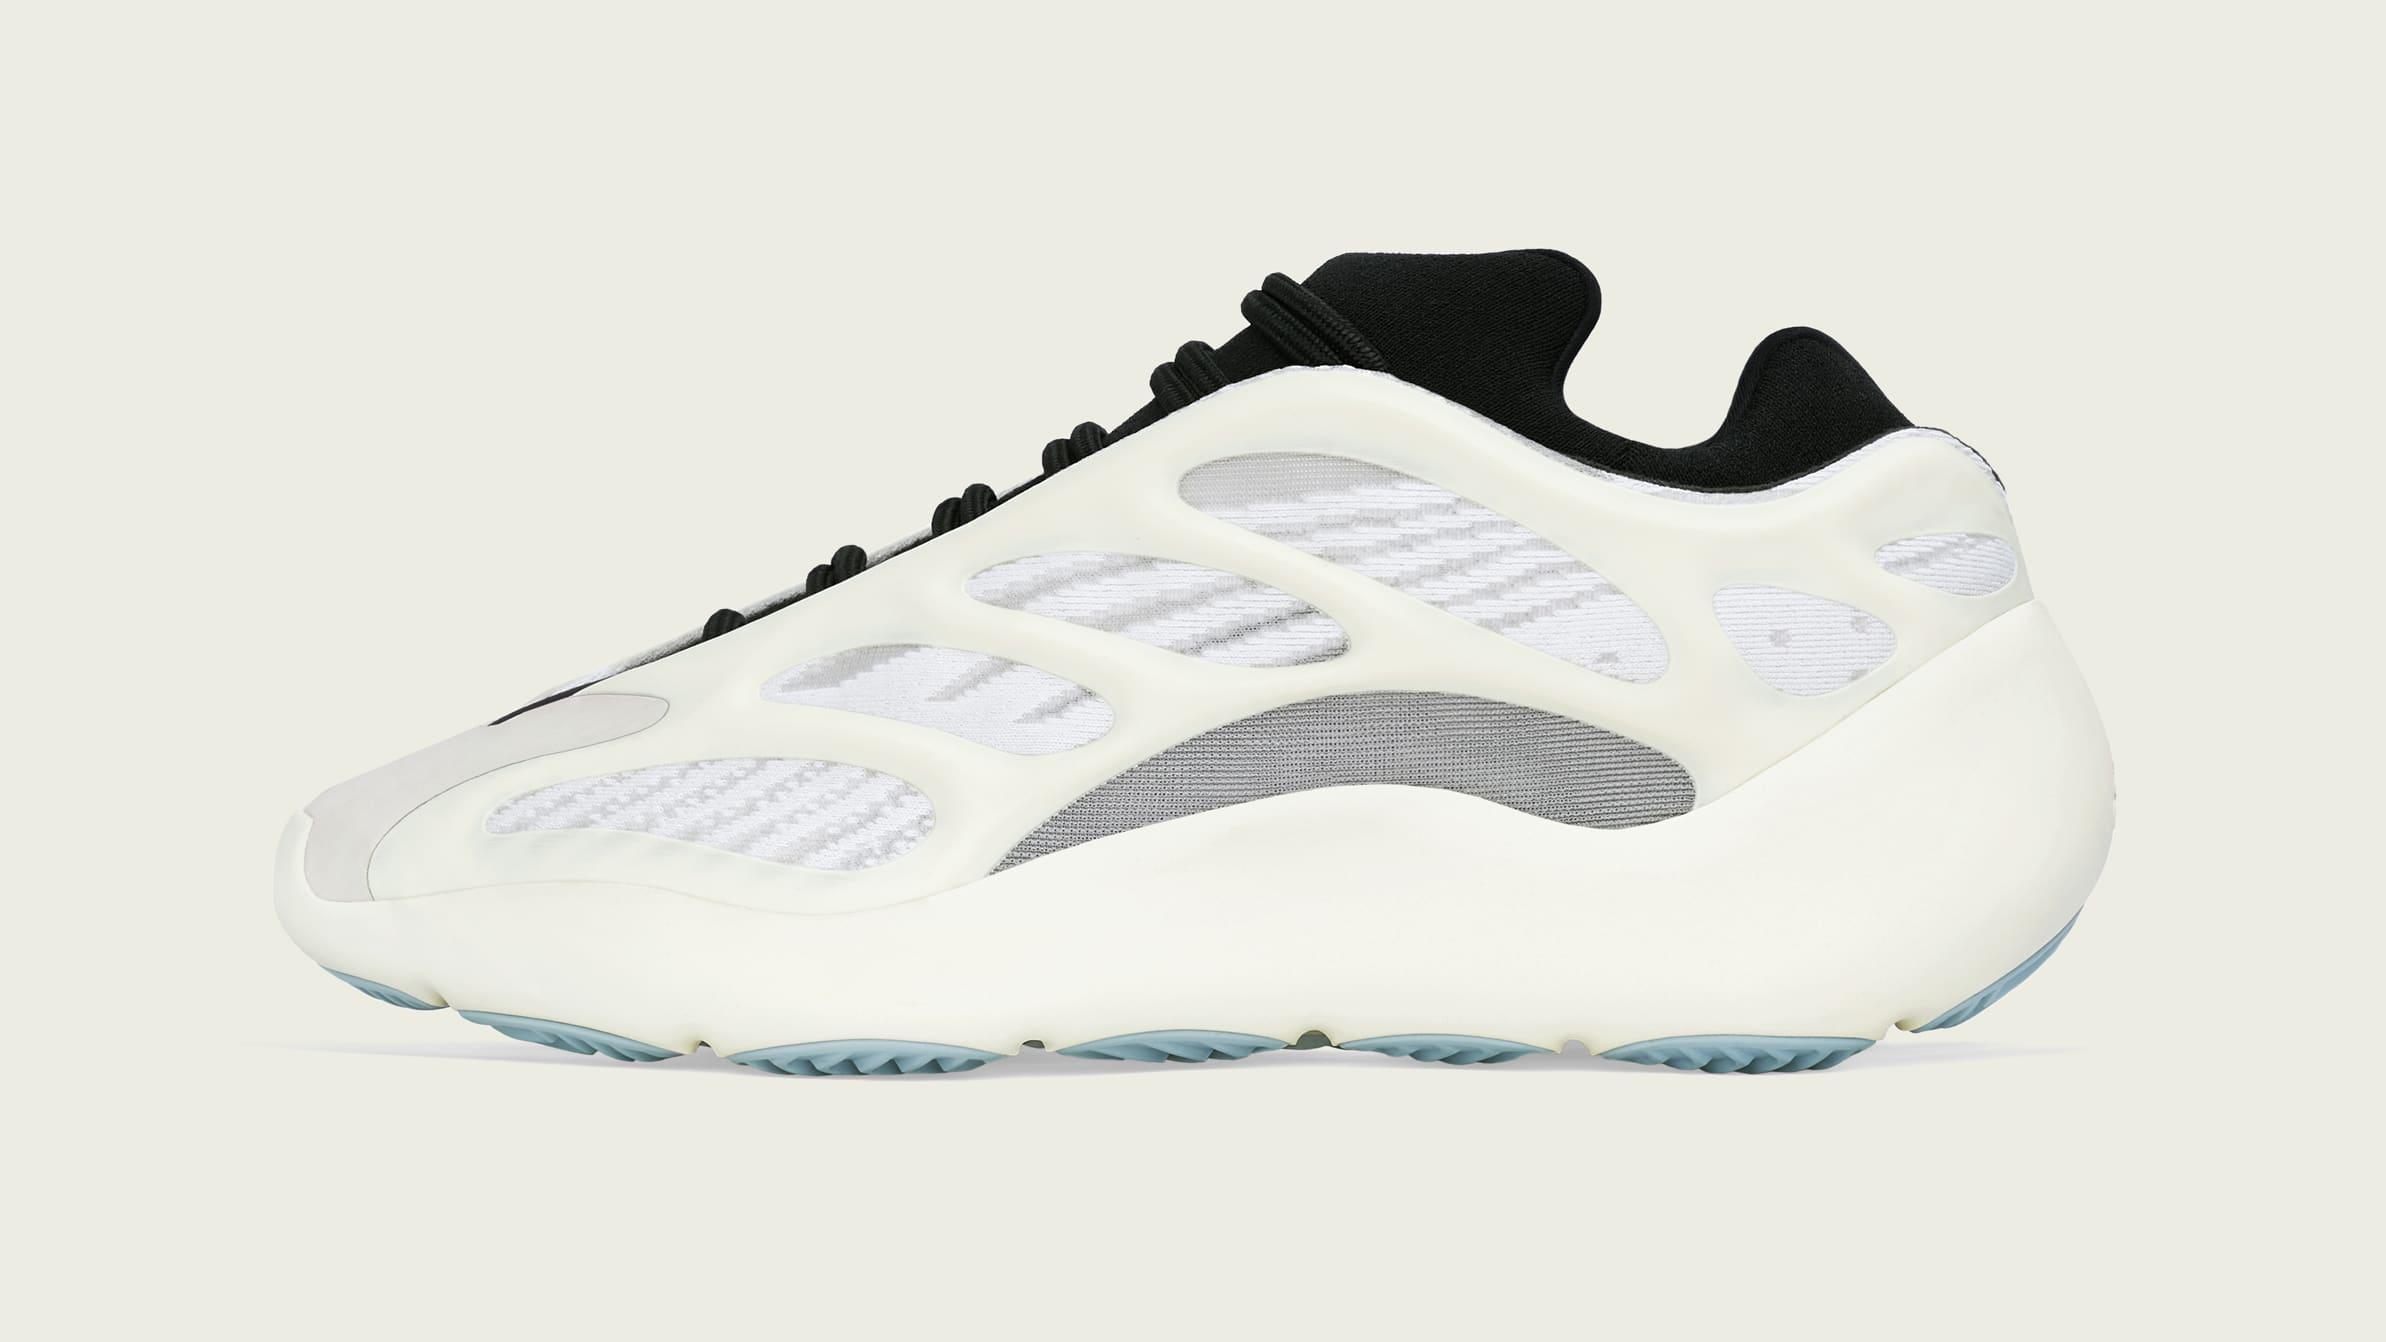 adidas-yeezy-700-v3-azael-medial